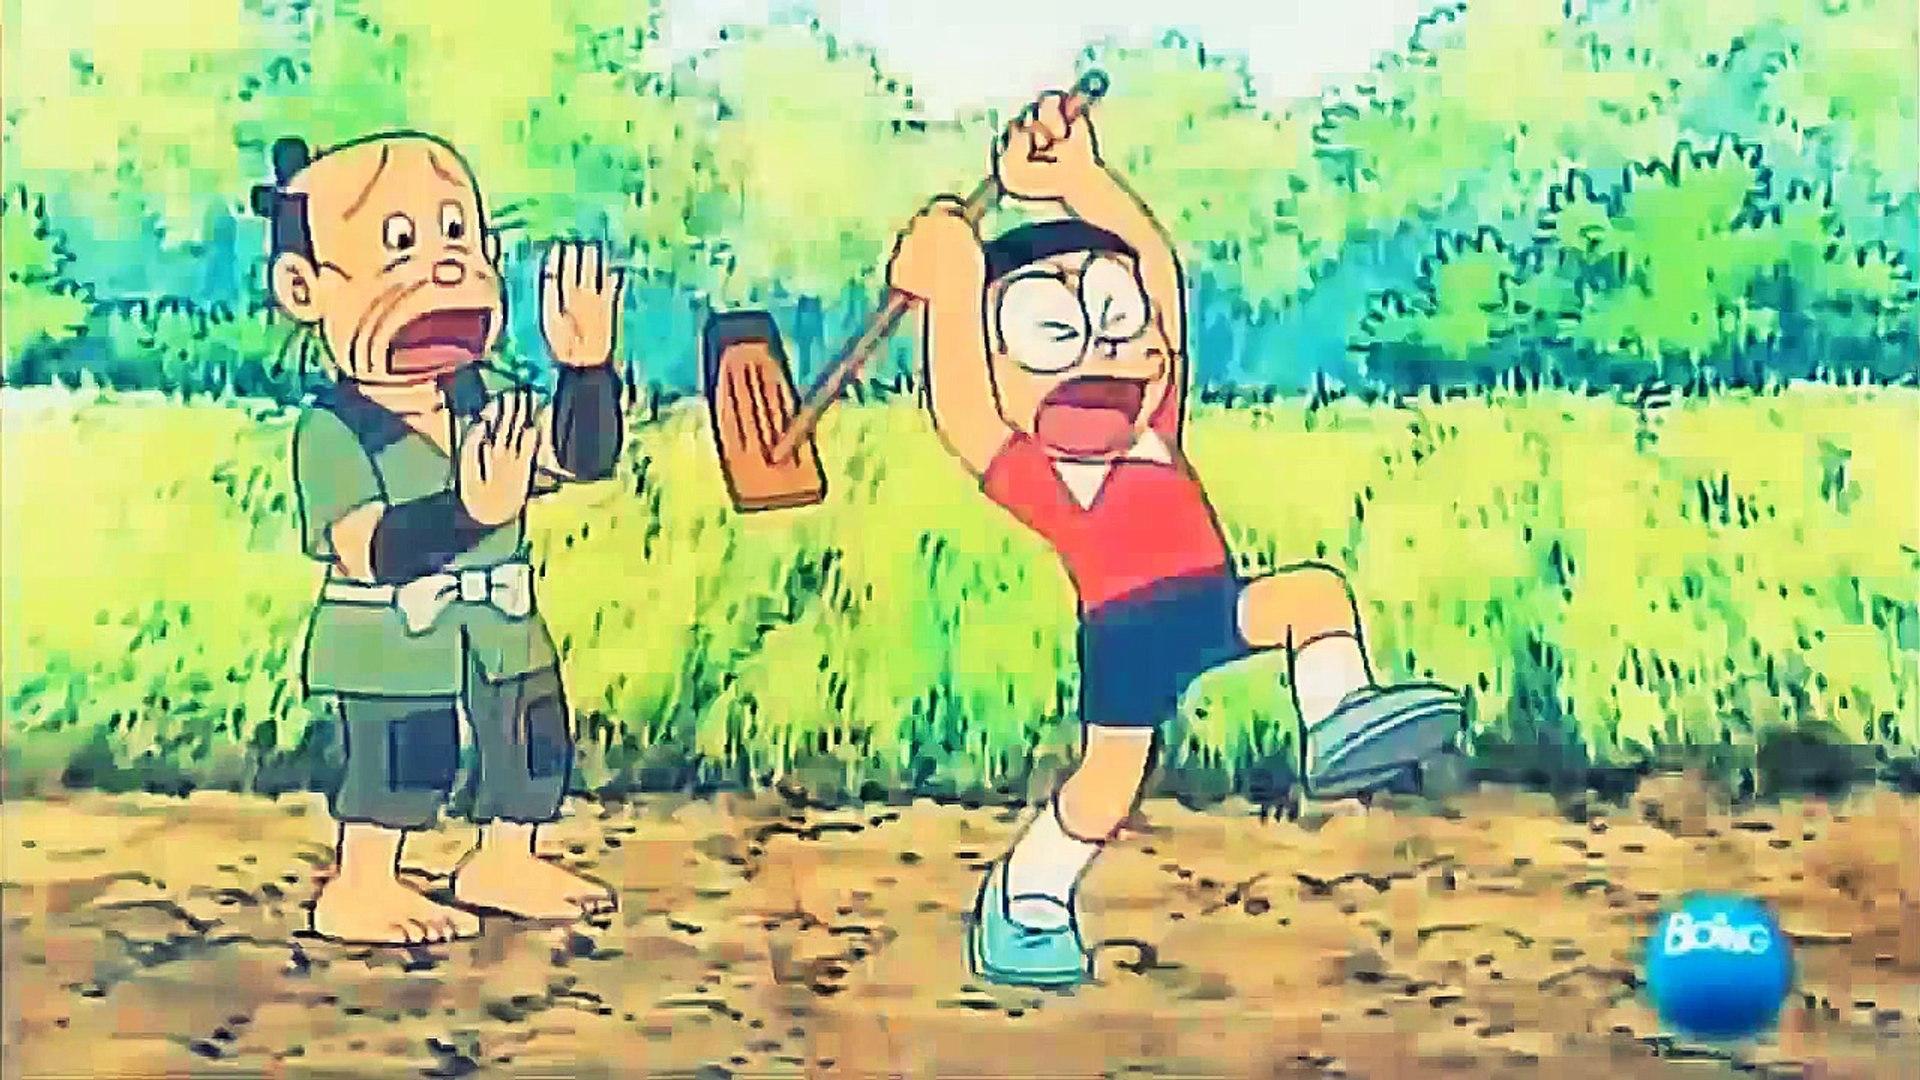 Bản sao của Hoạt Hình Doraemon Mới Nhất 2015 - Doraemon anime new 2015